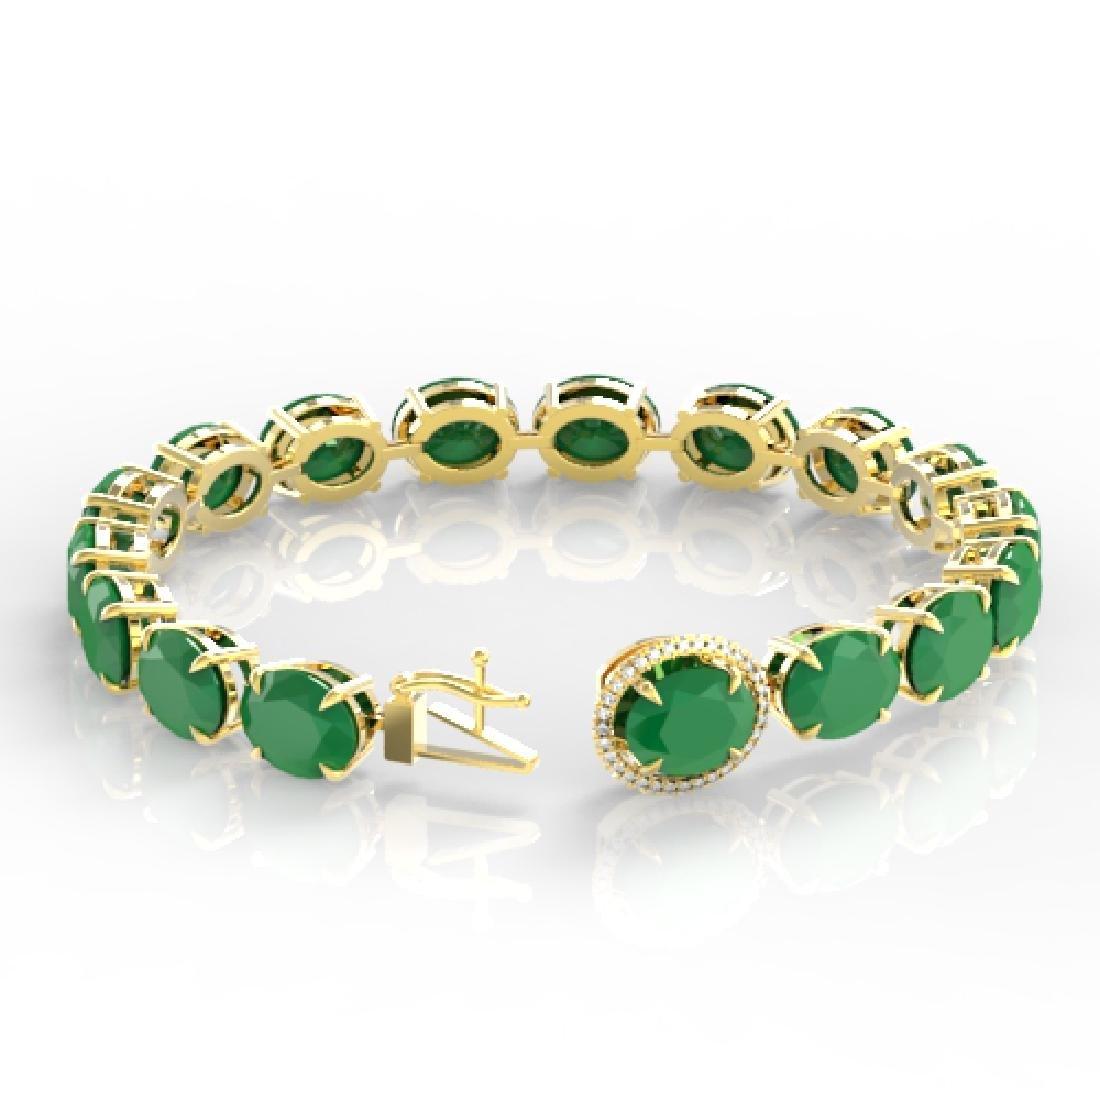 76 CTW Emerald & Micro Pave VS/SI Diamond Halo Bracelet - 3